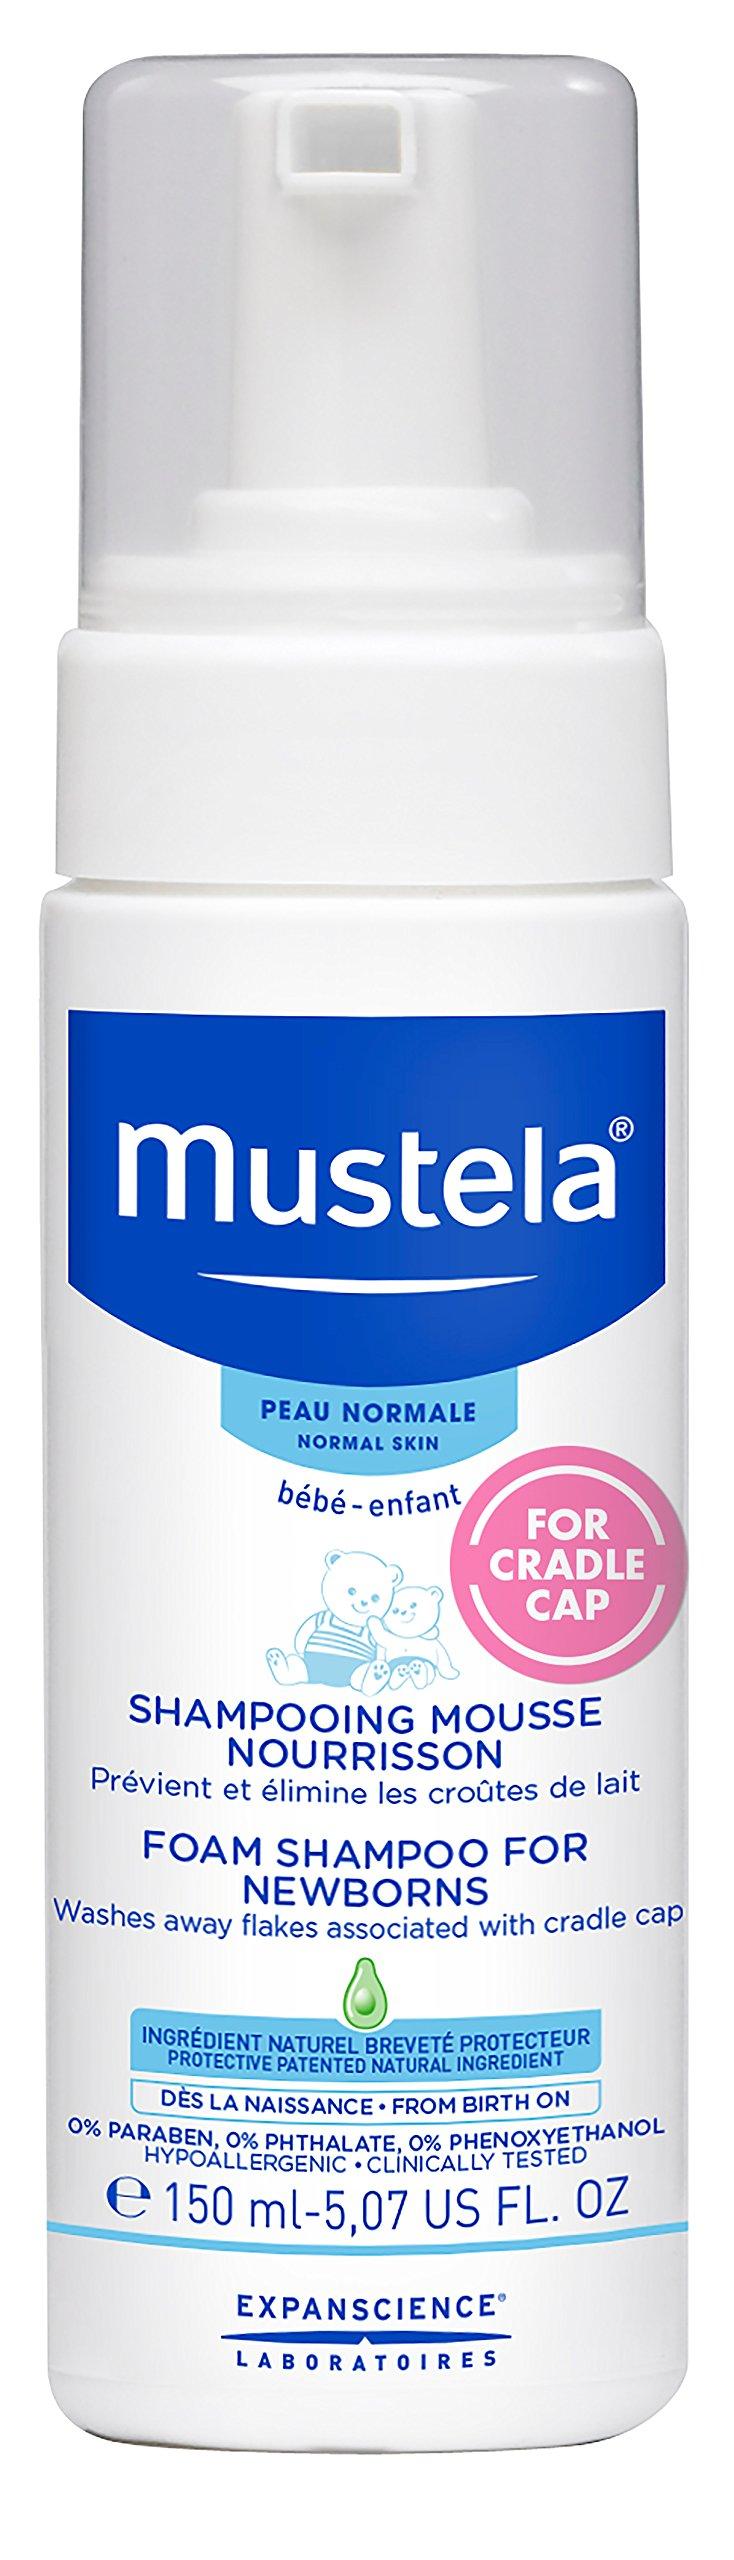 Mustela Foam Shampoo for Newborns, Baby Shampoo, Cradle Cap Treatment and Prevention, 5.07 fl.oz.